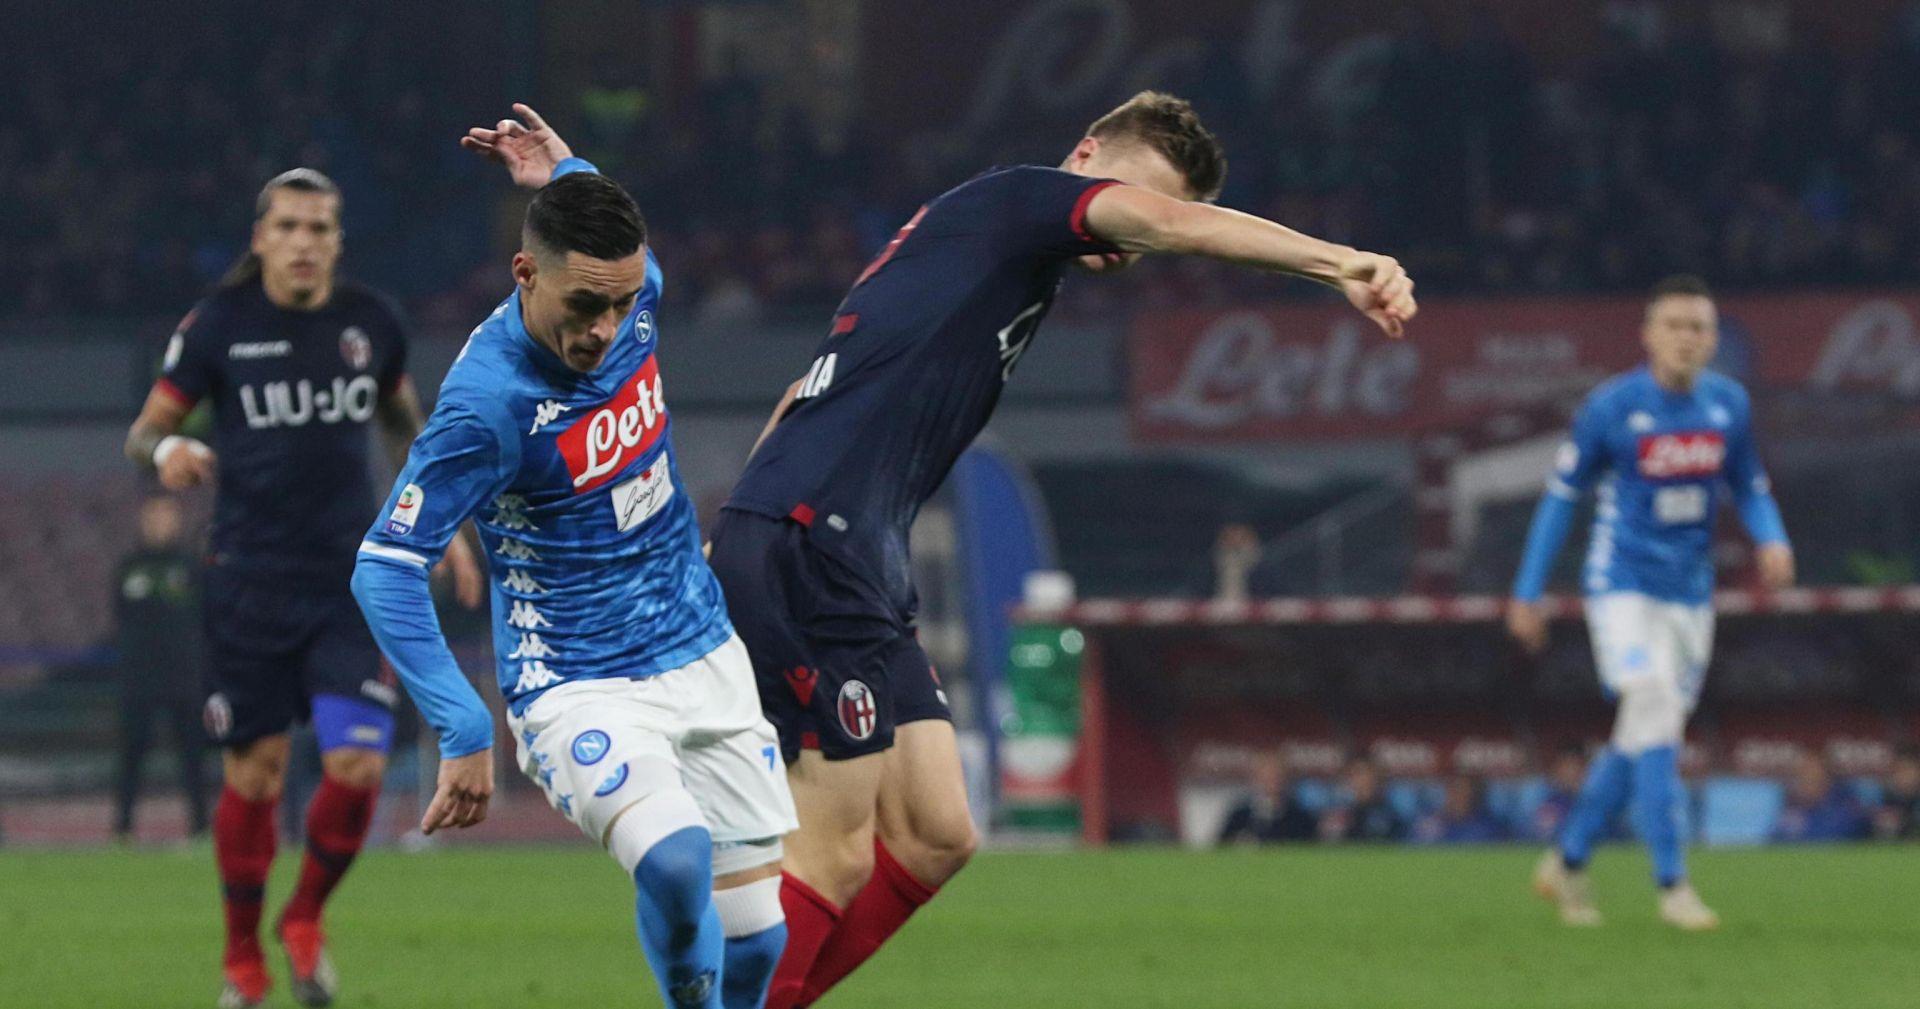 SERIE A Napoli u finišu 'slomio' Bolognu